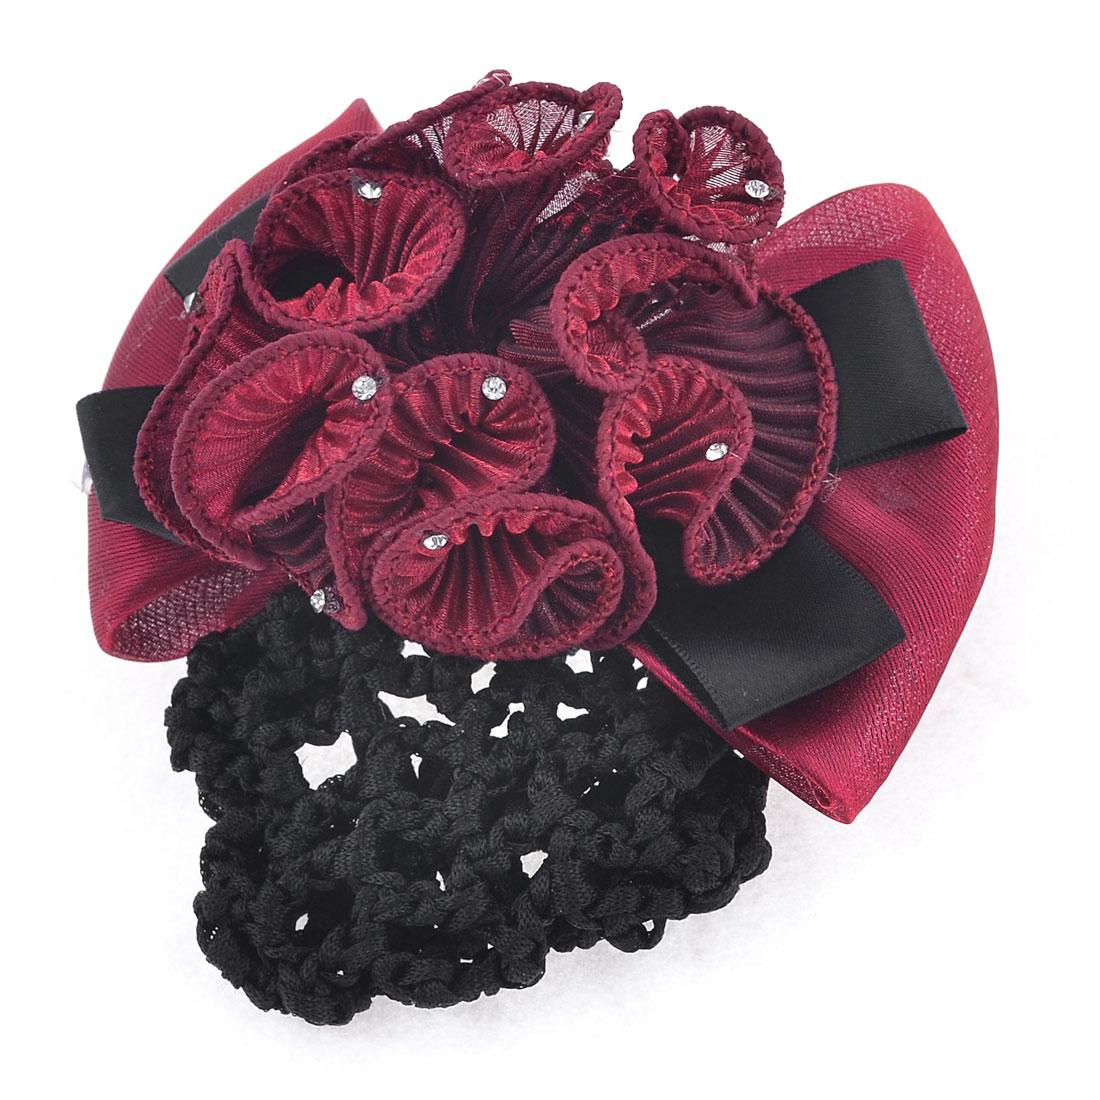 Rhinestone Detail Burgundy Black Bowtie Decor Hairclip w Hairnet for Women